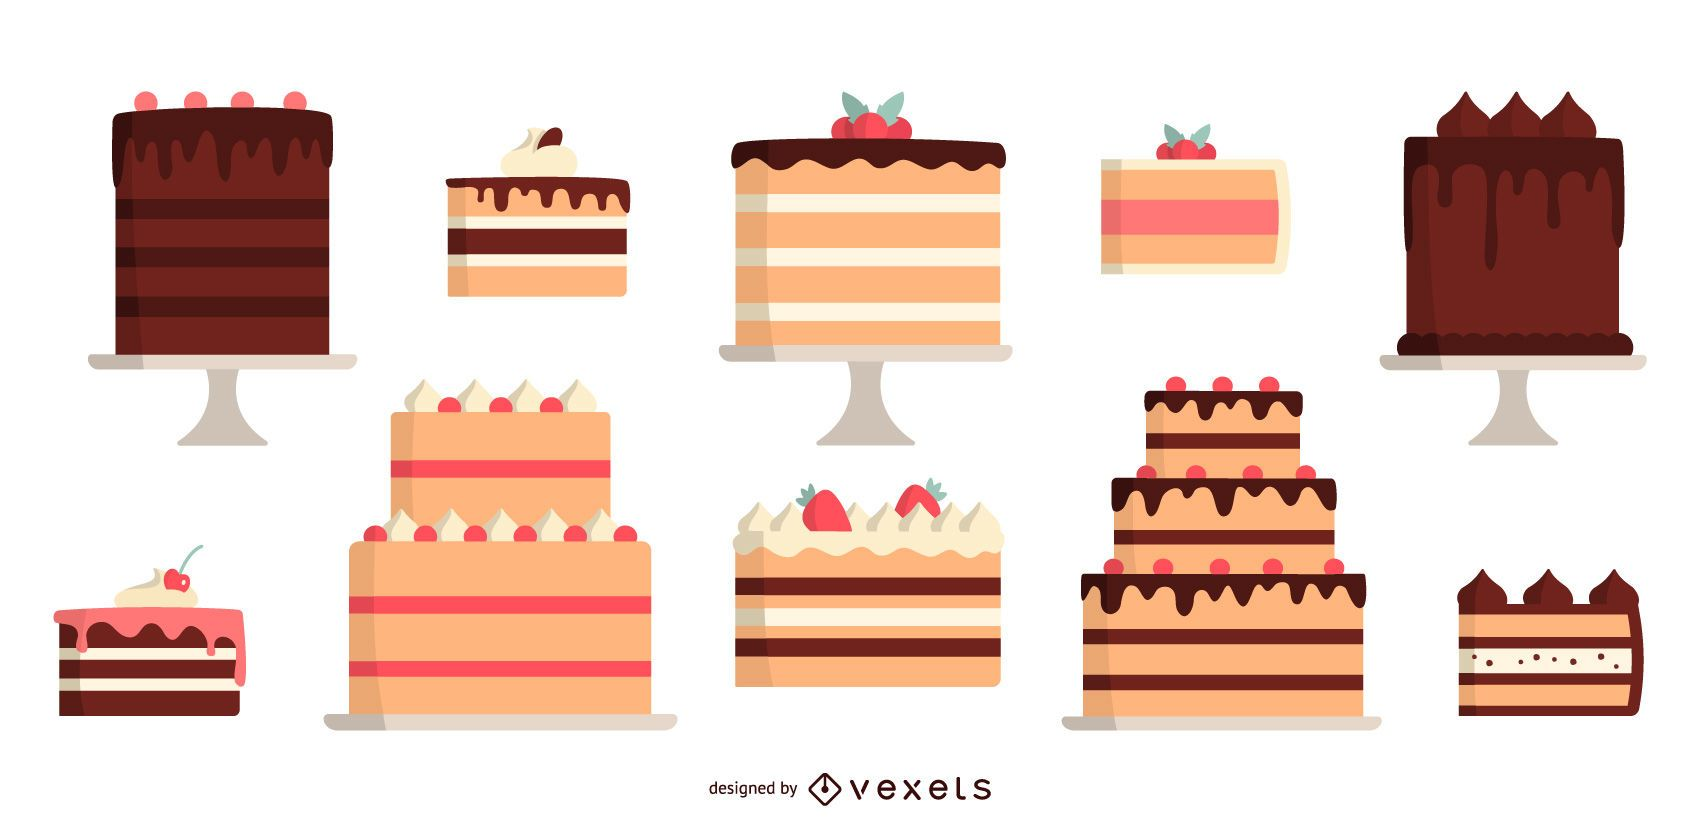 Flat Design Colored Cake Design Pack